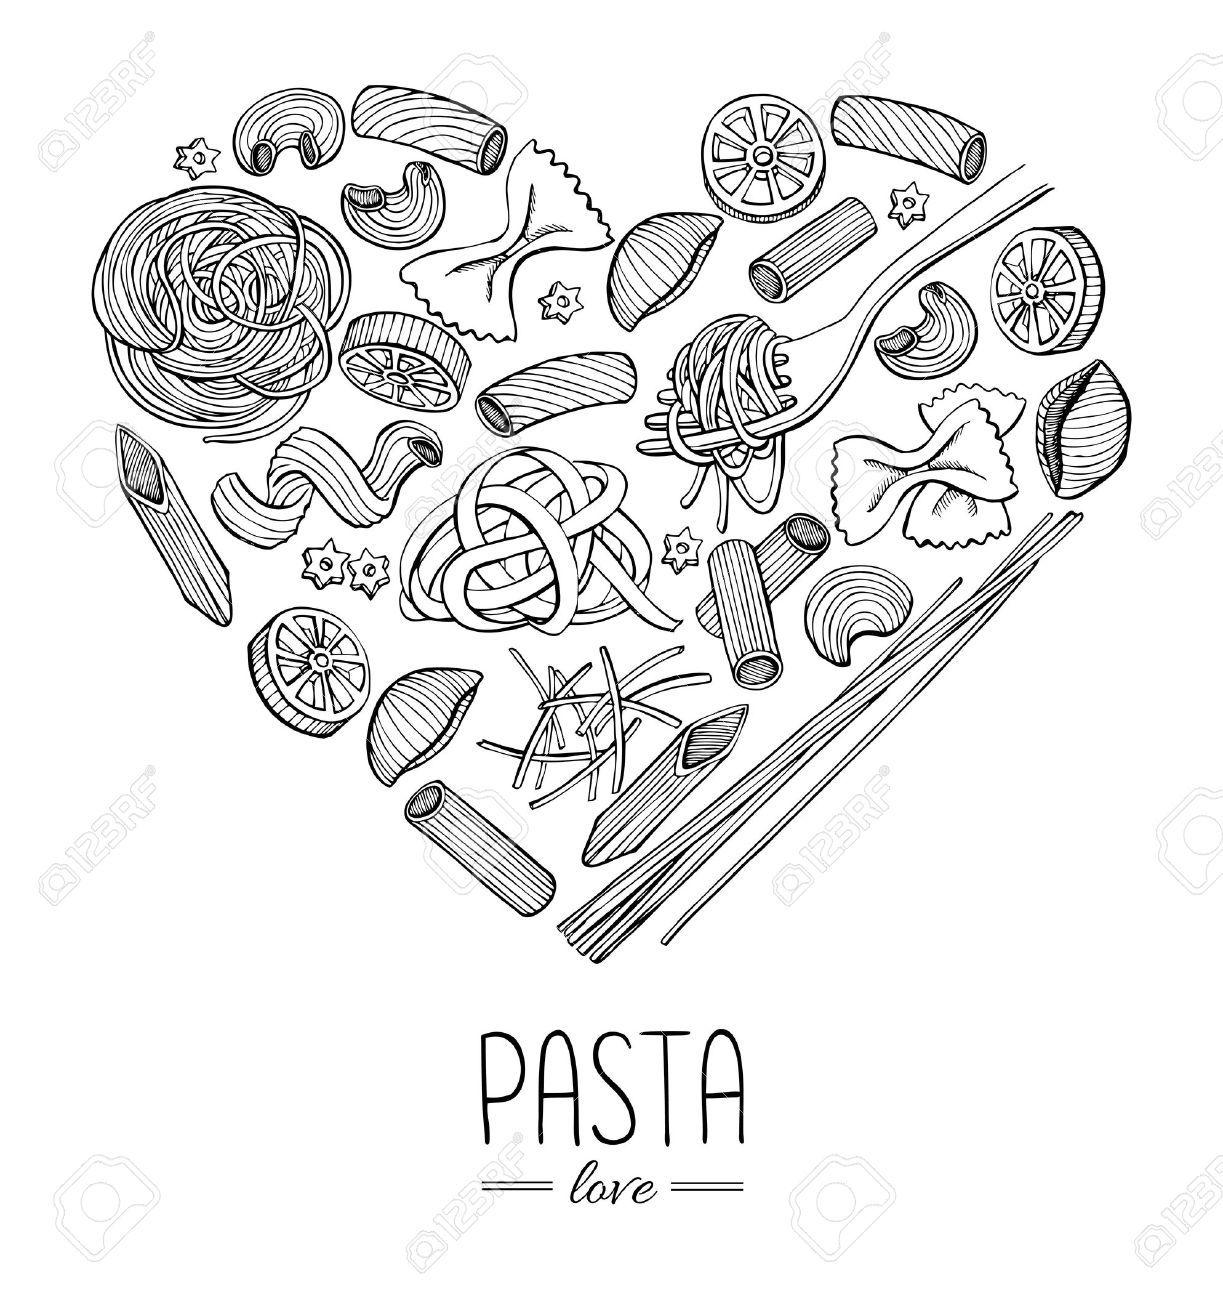 Vector Vintage Italian Pasta Restaurant Illustration In Heart Shape Hand Drawn Banner Great For Menu Banner Pasta Restaurants Italian Pasta Banner Drawing